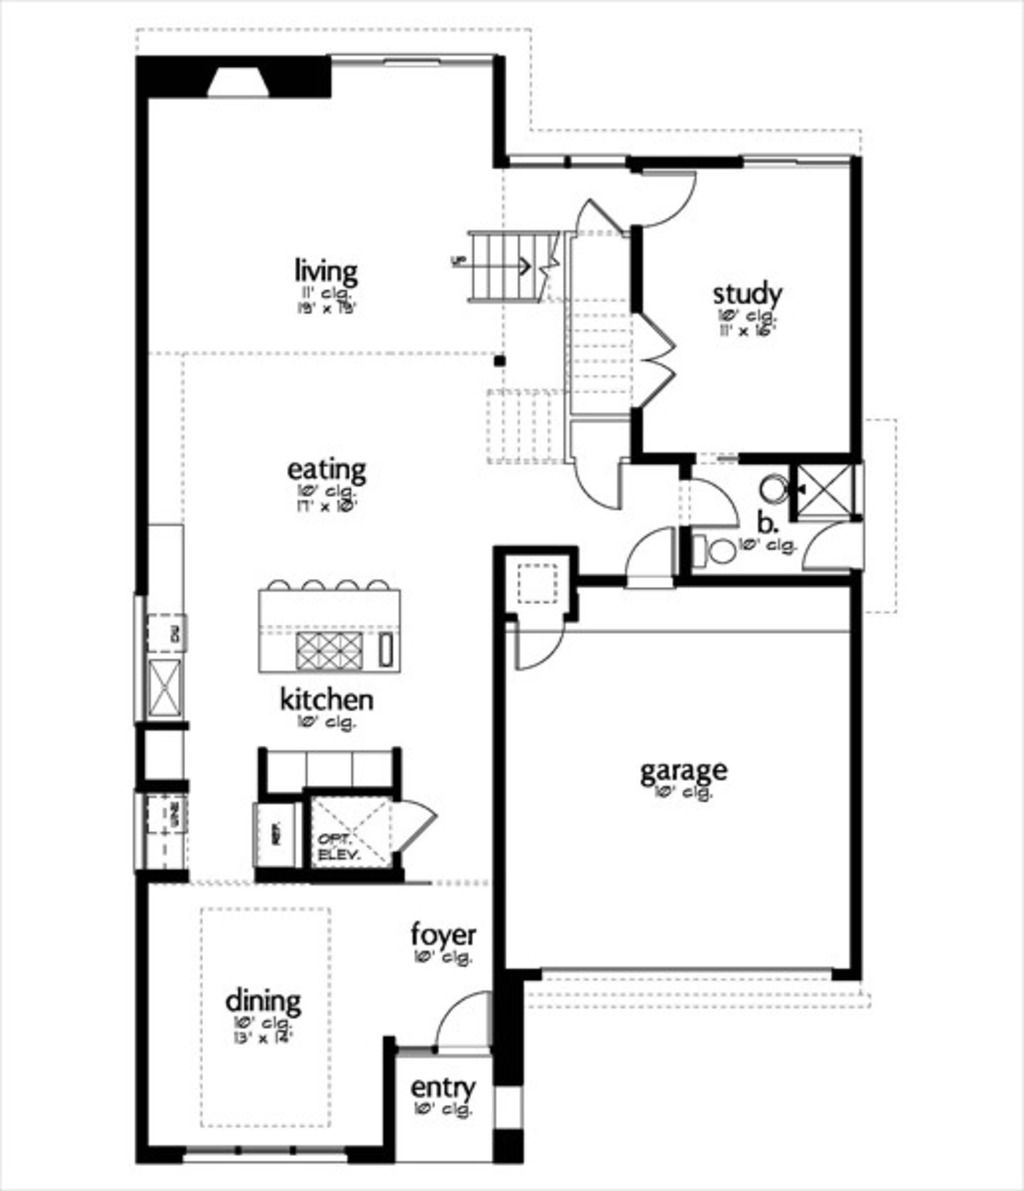 2d plan of modern houses modern house houseplans com plan 449 5 main floor study can be my modern house